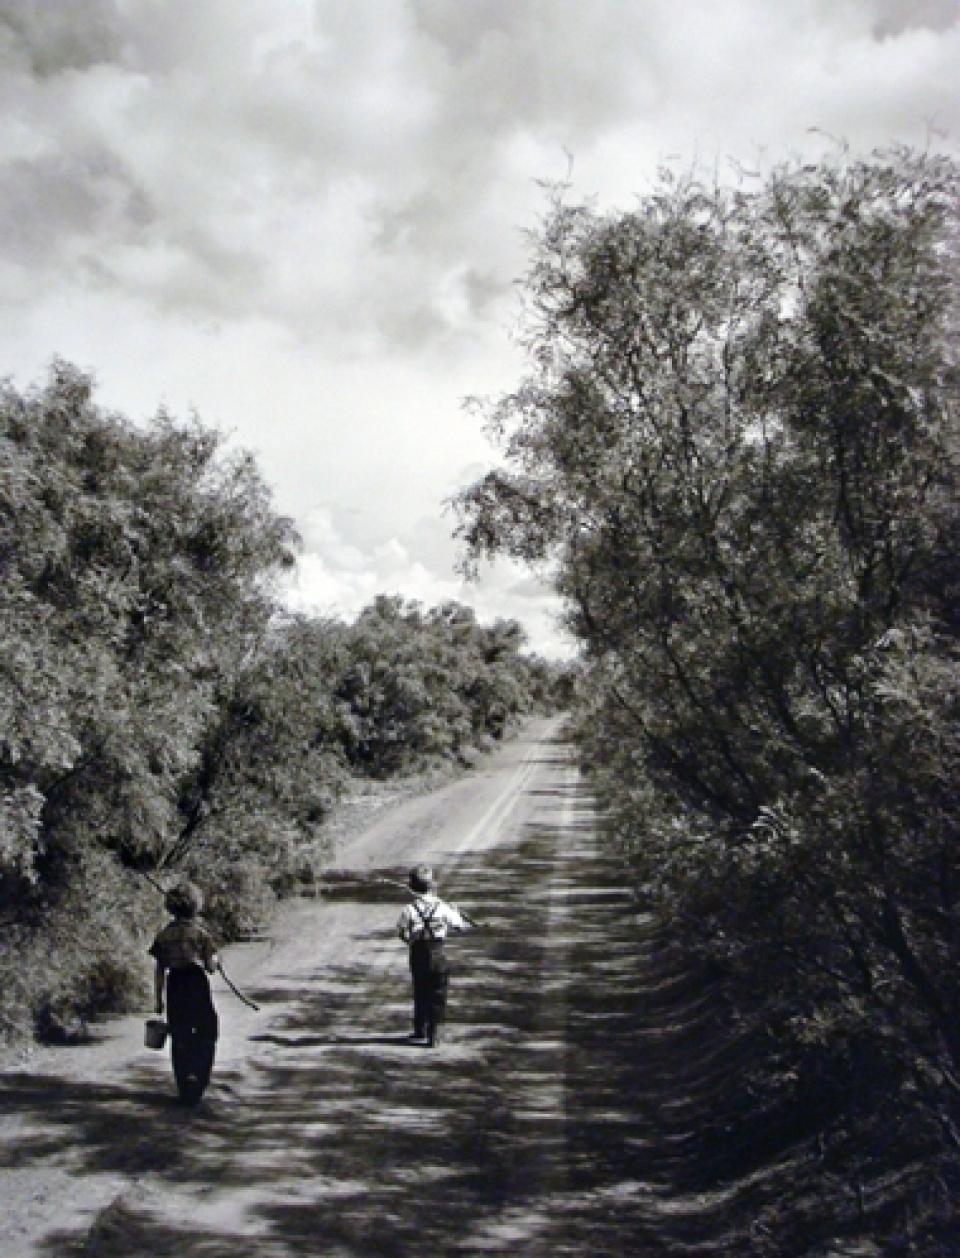 John Dominis. Going fishing, Texas, 1952